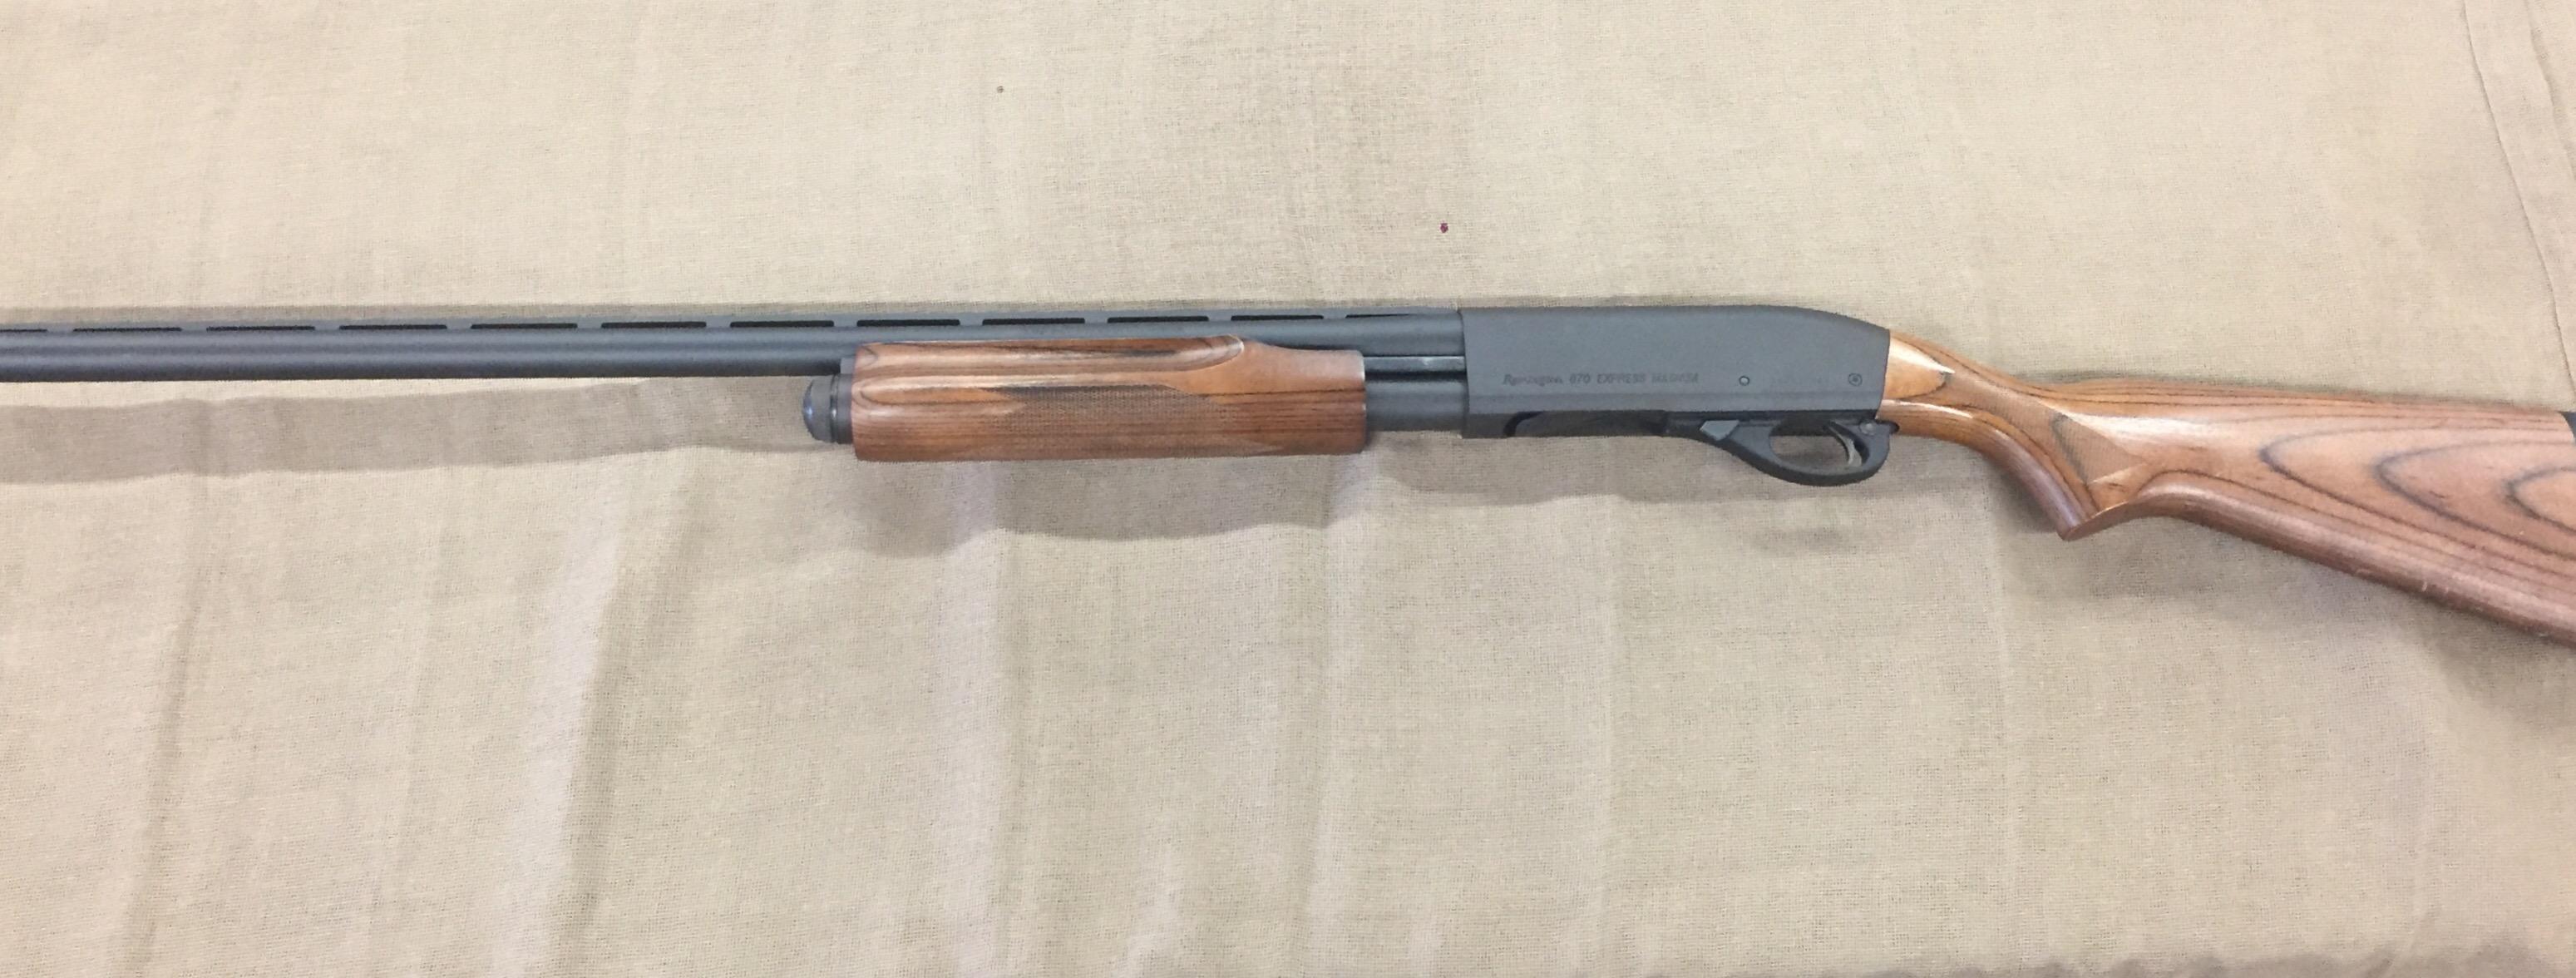 remington 870 express magnum 12ga 28 barrel laminated used